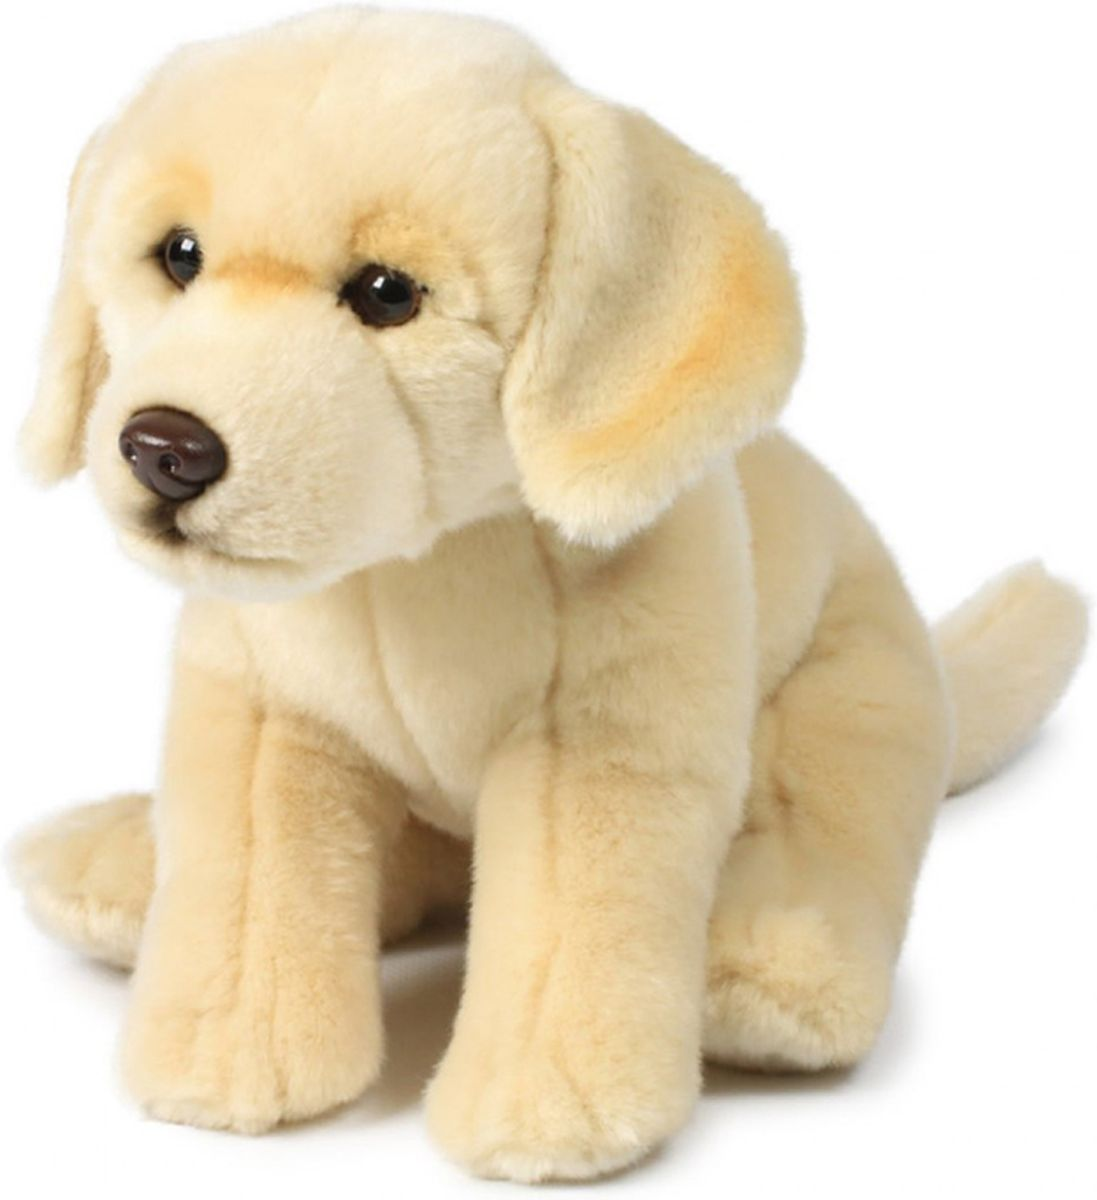 Anna Club Plush Мягкая игрушка Лабрадор 26 см - Мягкие игрушки